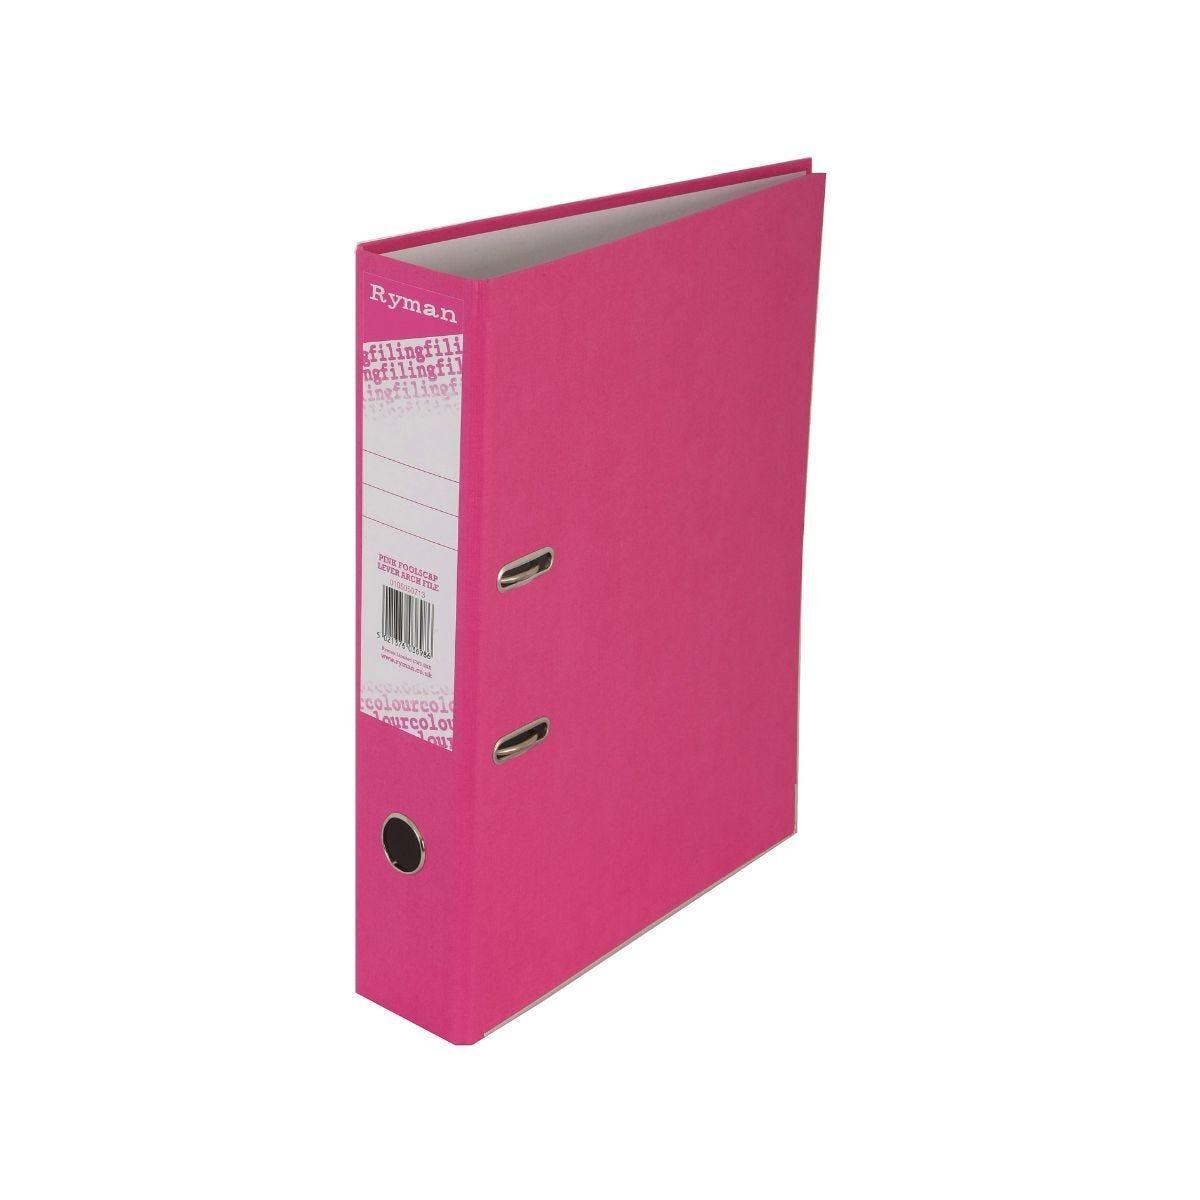 Ryman Colour Lever Arch File Foolscap Pink